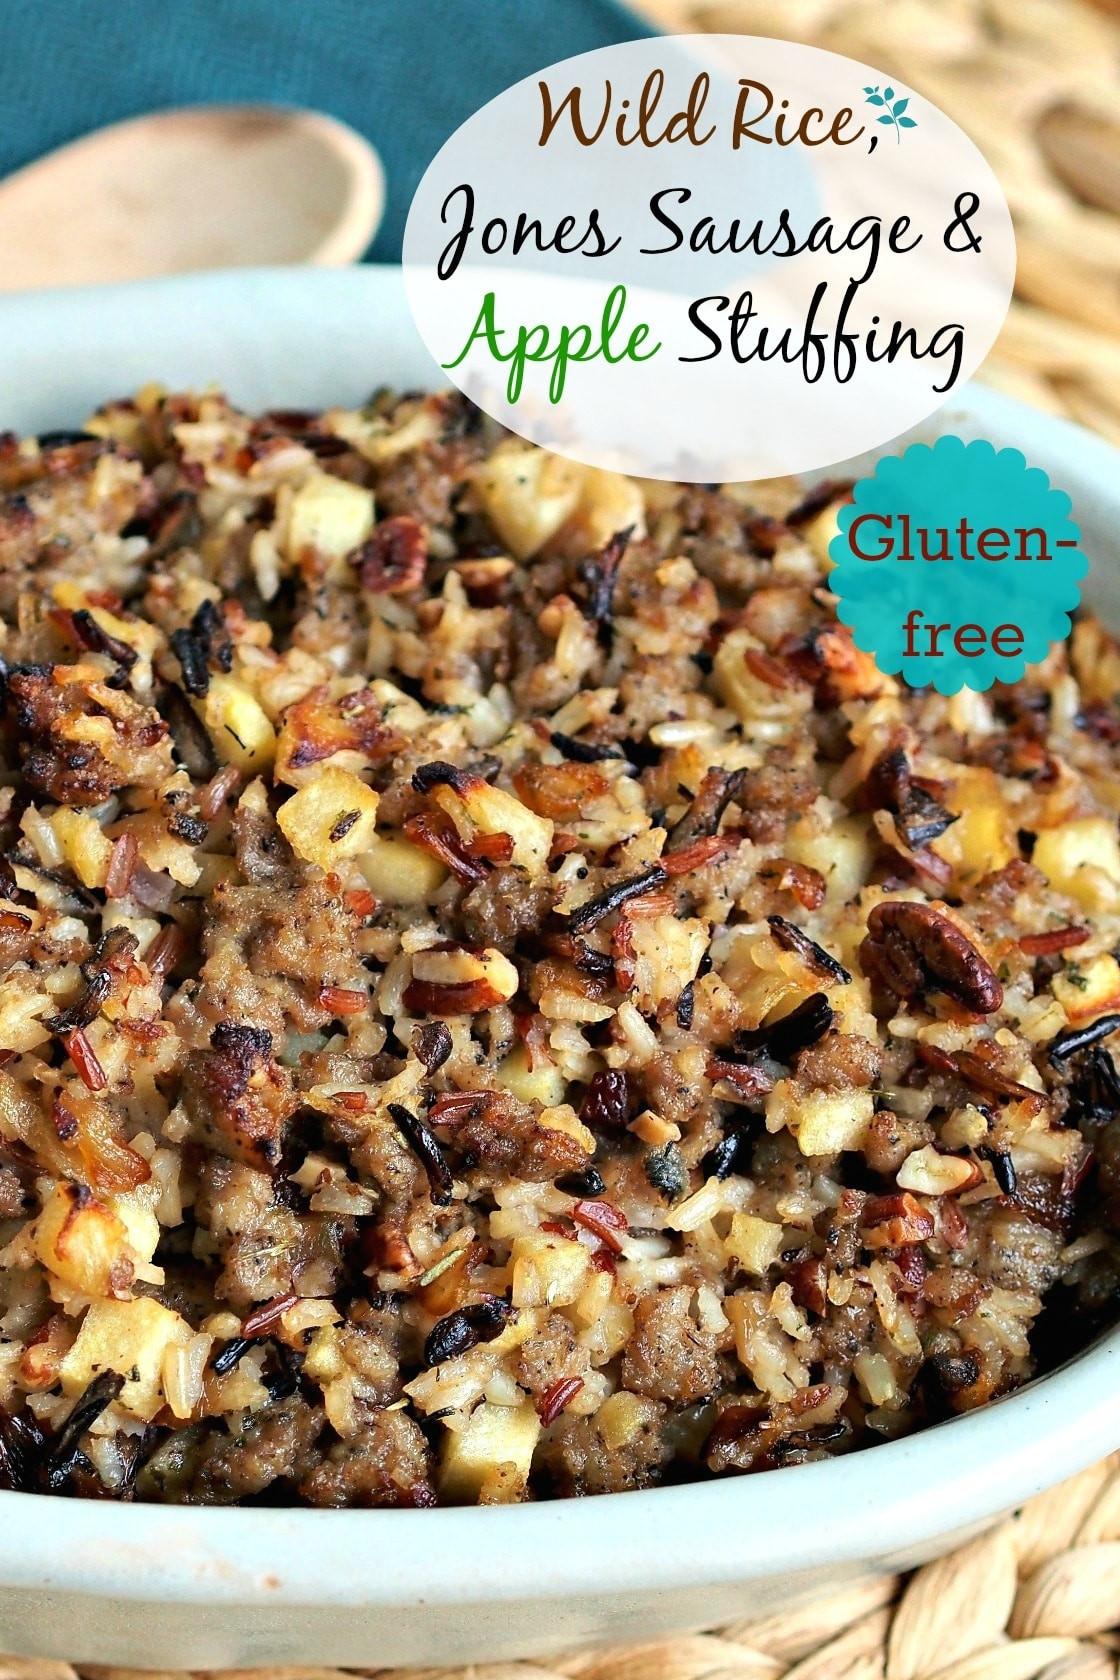 Thanksgiving Wild Rice Stuffing  Wild Rice Jones Sausage & Apple Stuffing Simply Sated